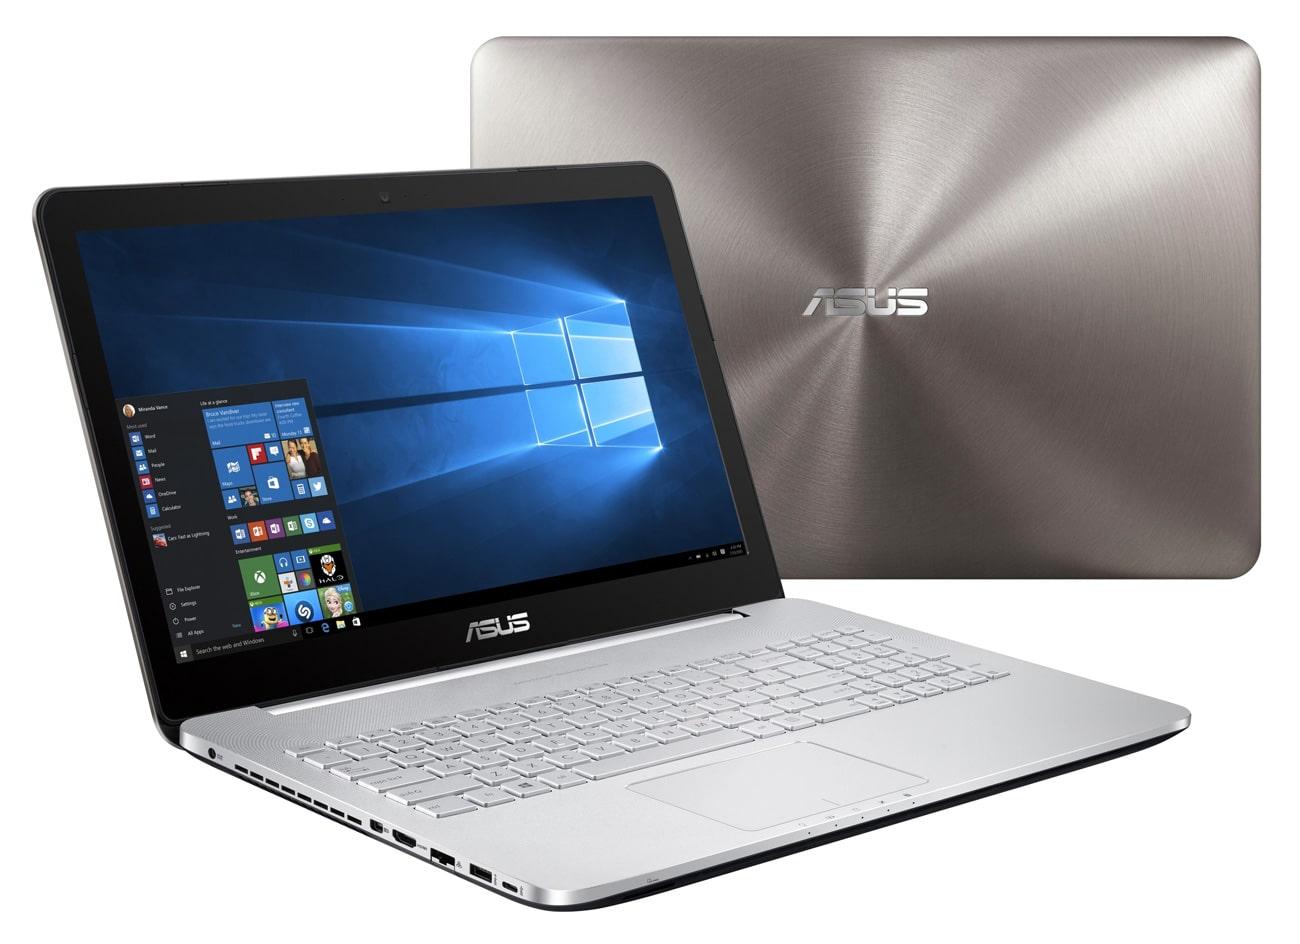 Asus N552VW-FI266T, PC portable 15 pouces 4K SSD Blu-Ray Quad i7 promo 1399€